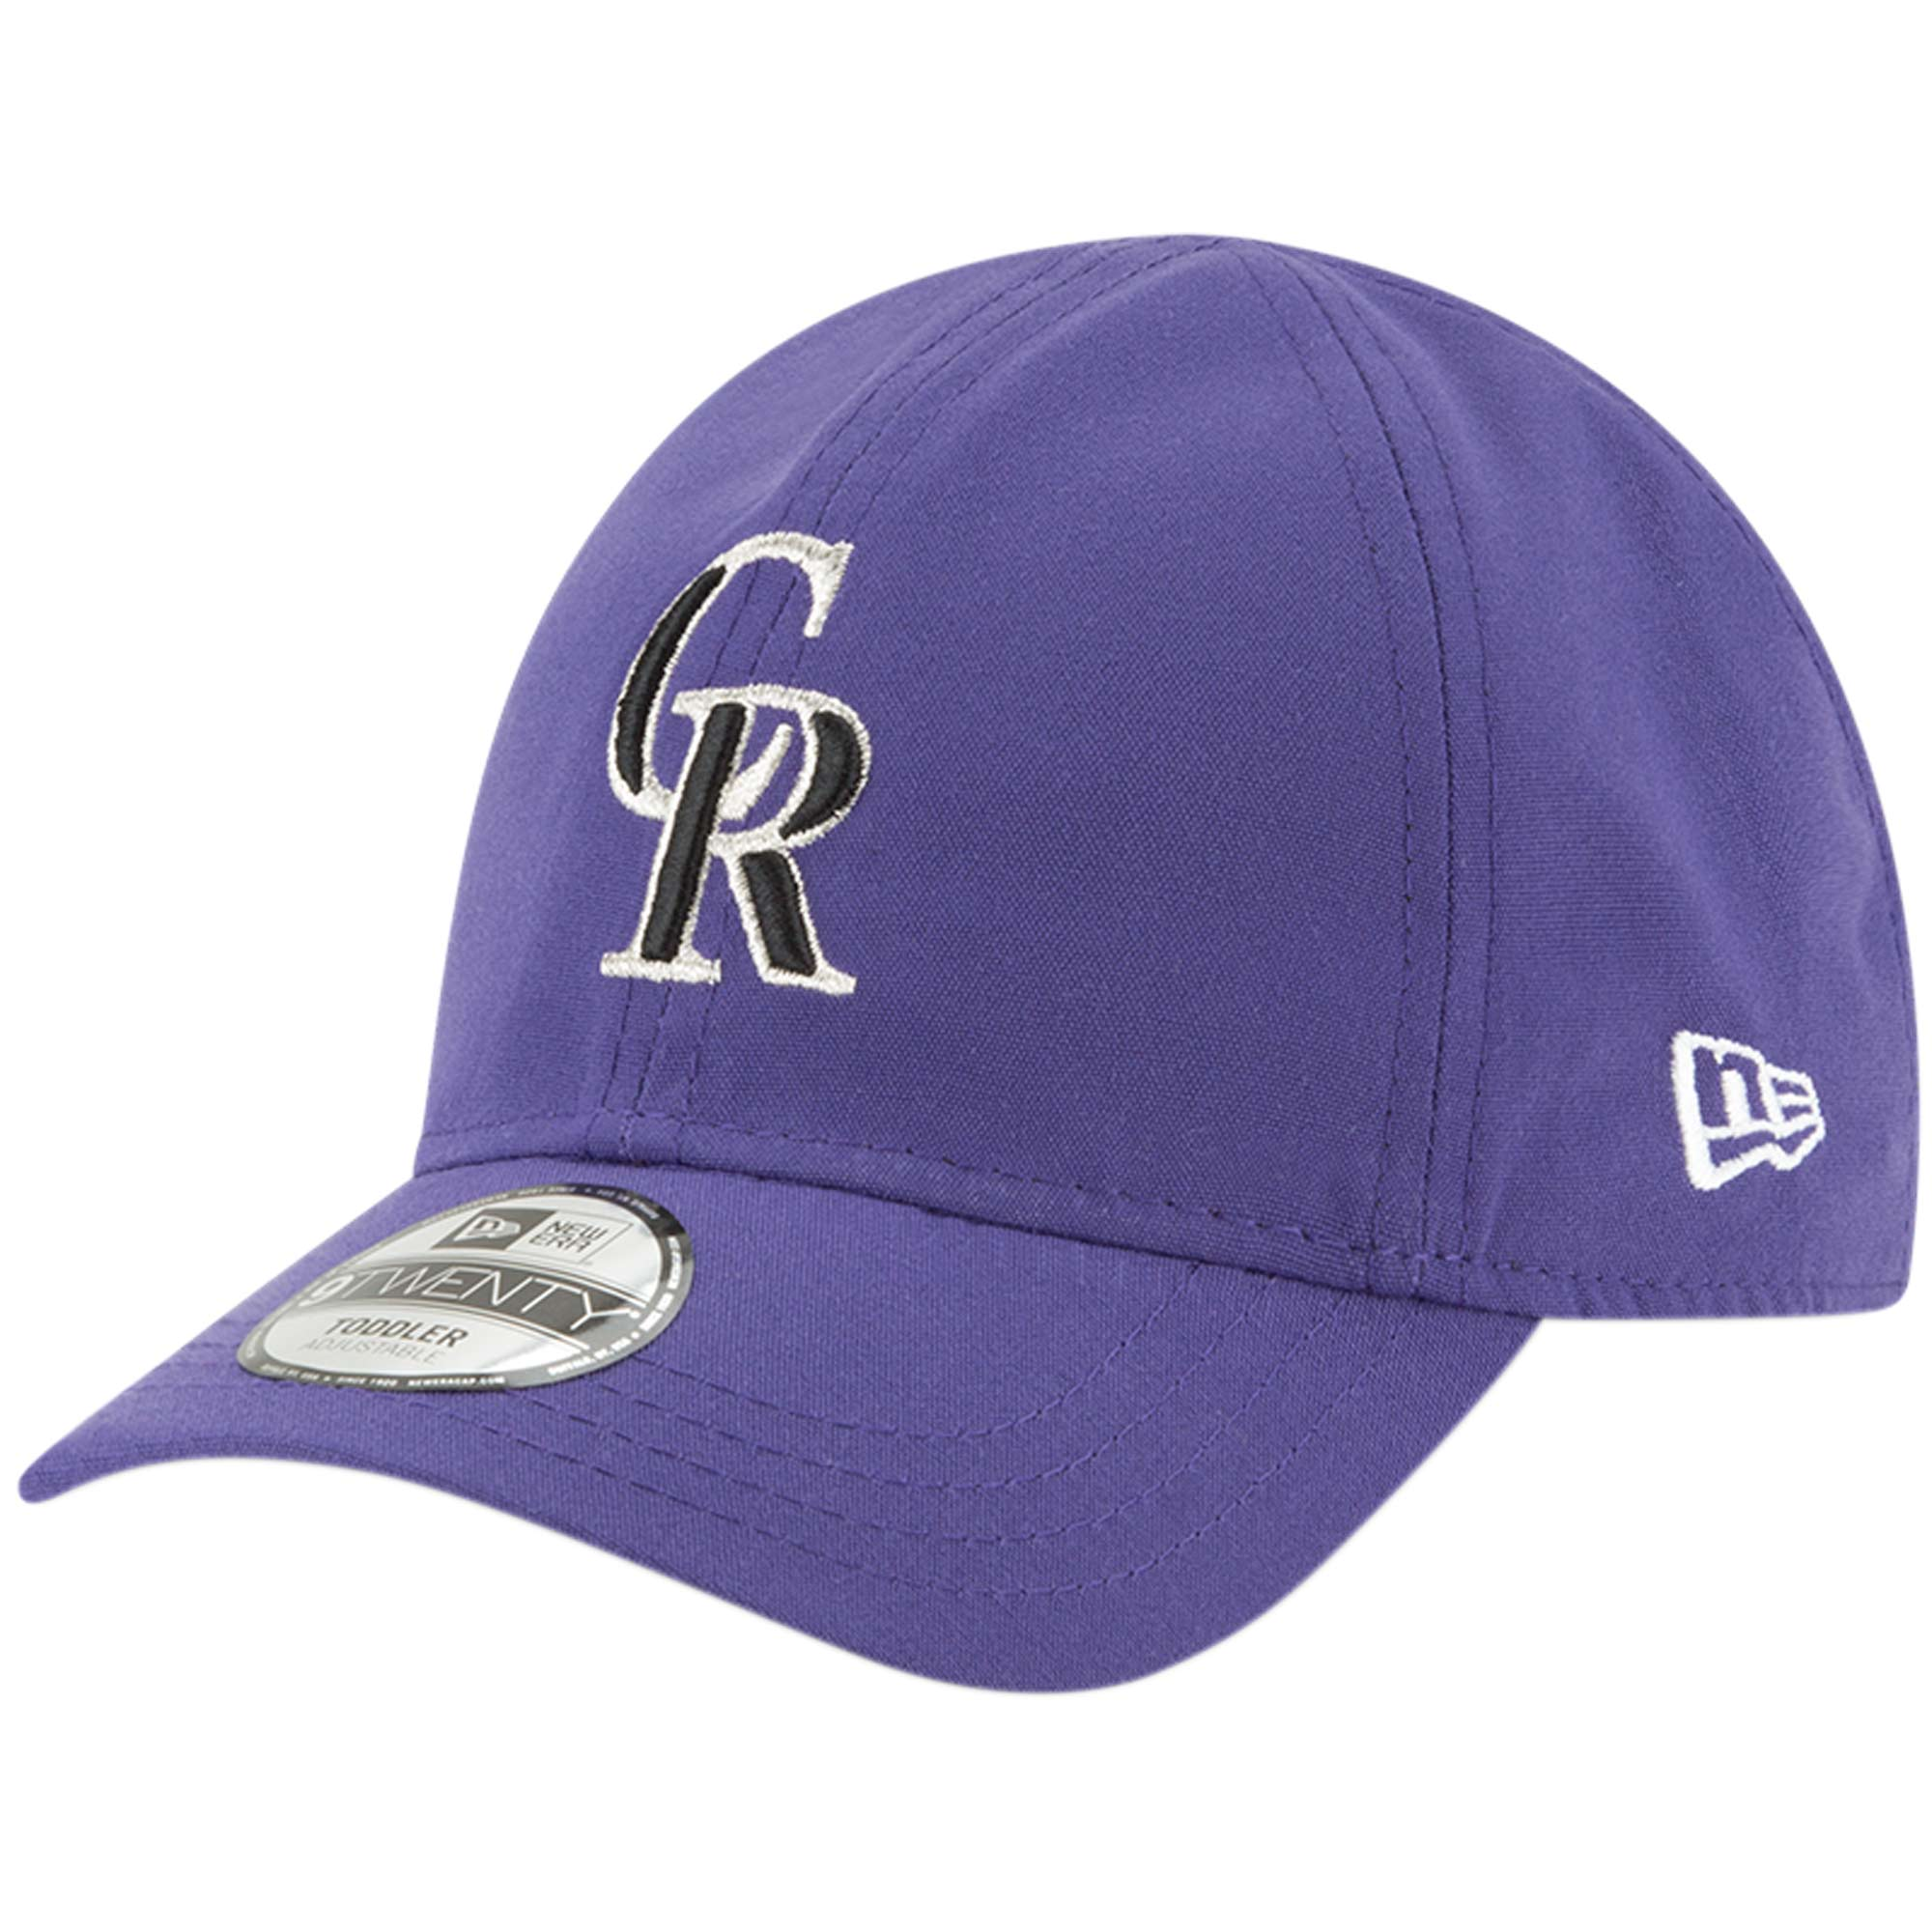 Colorado Rockies New Era Toddler My 1st 9TWENTY Adjustable Hat - Purple - OSFA